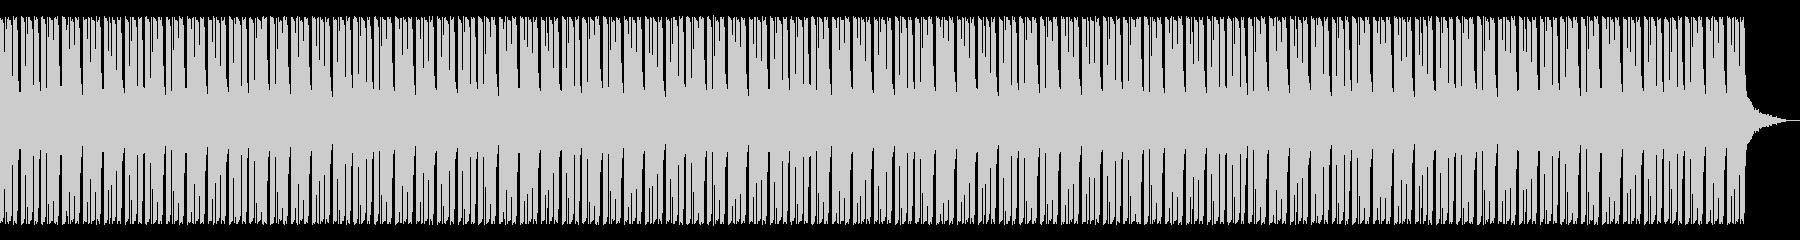 coldstart441の未再生の波形